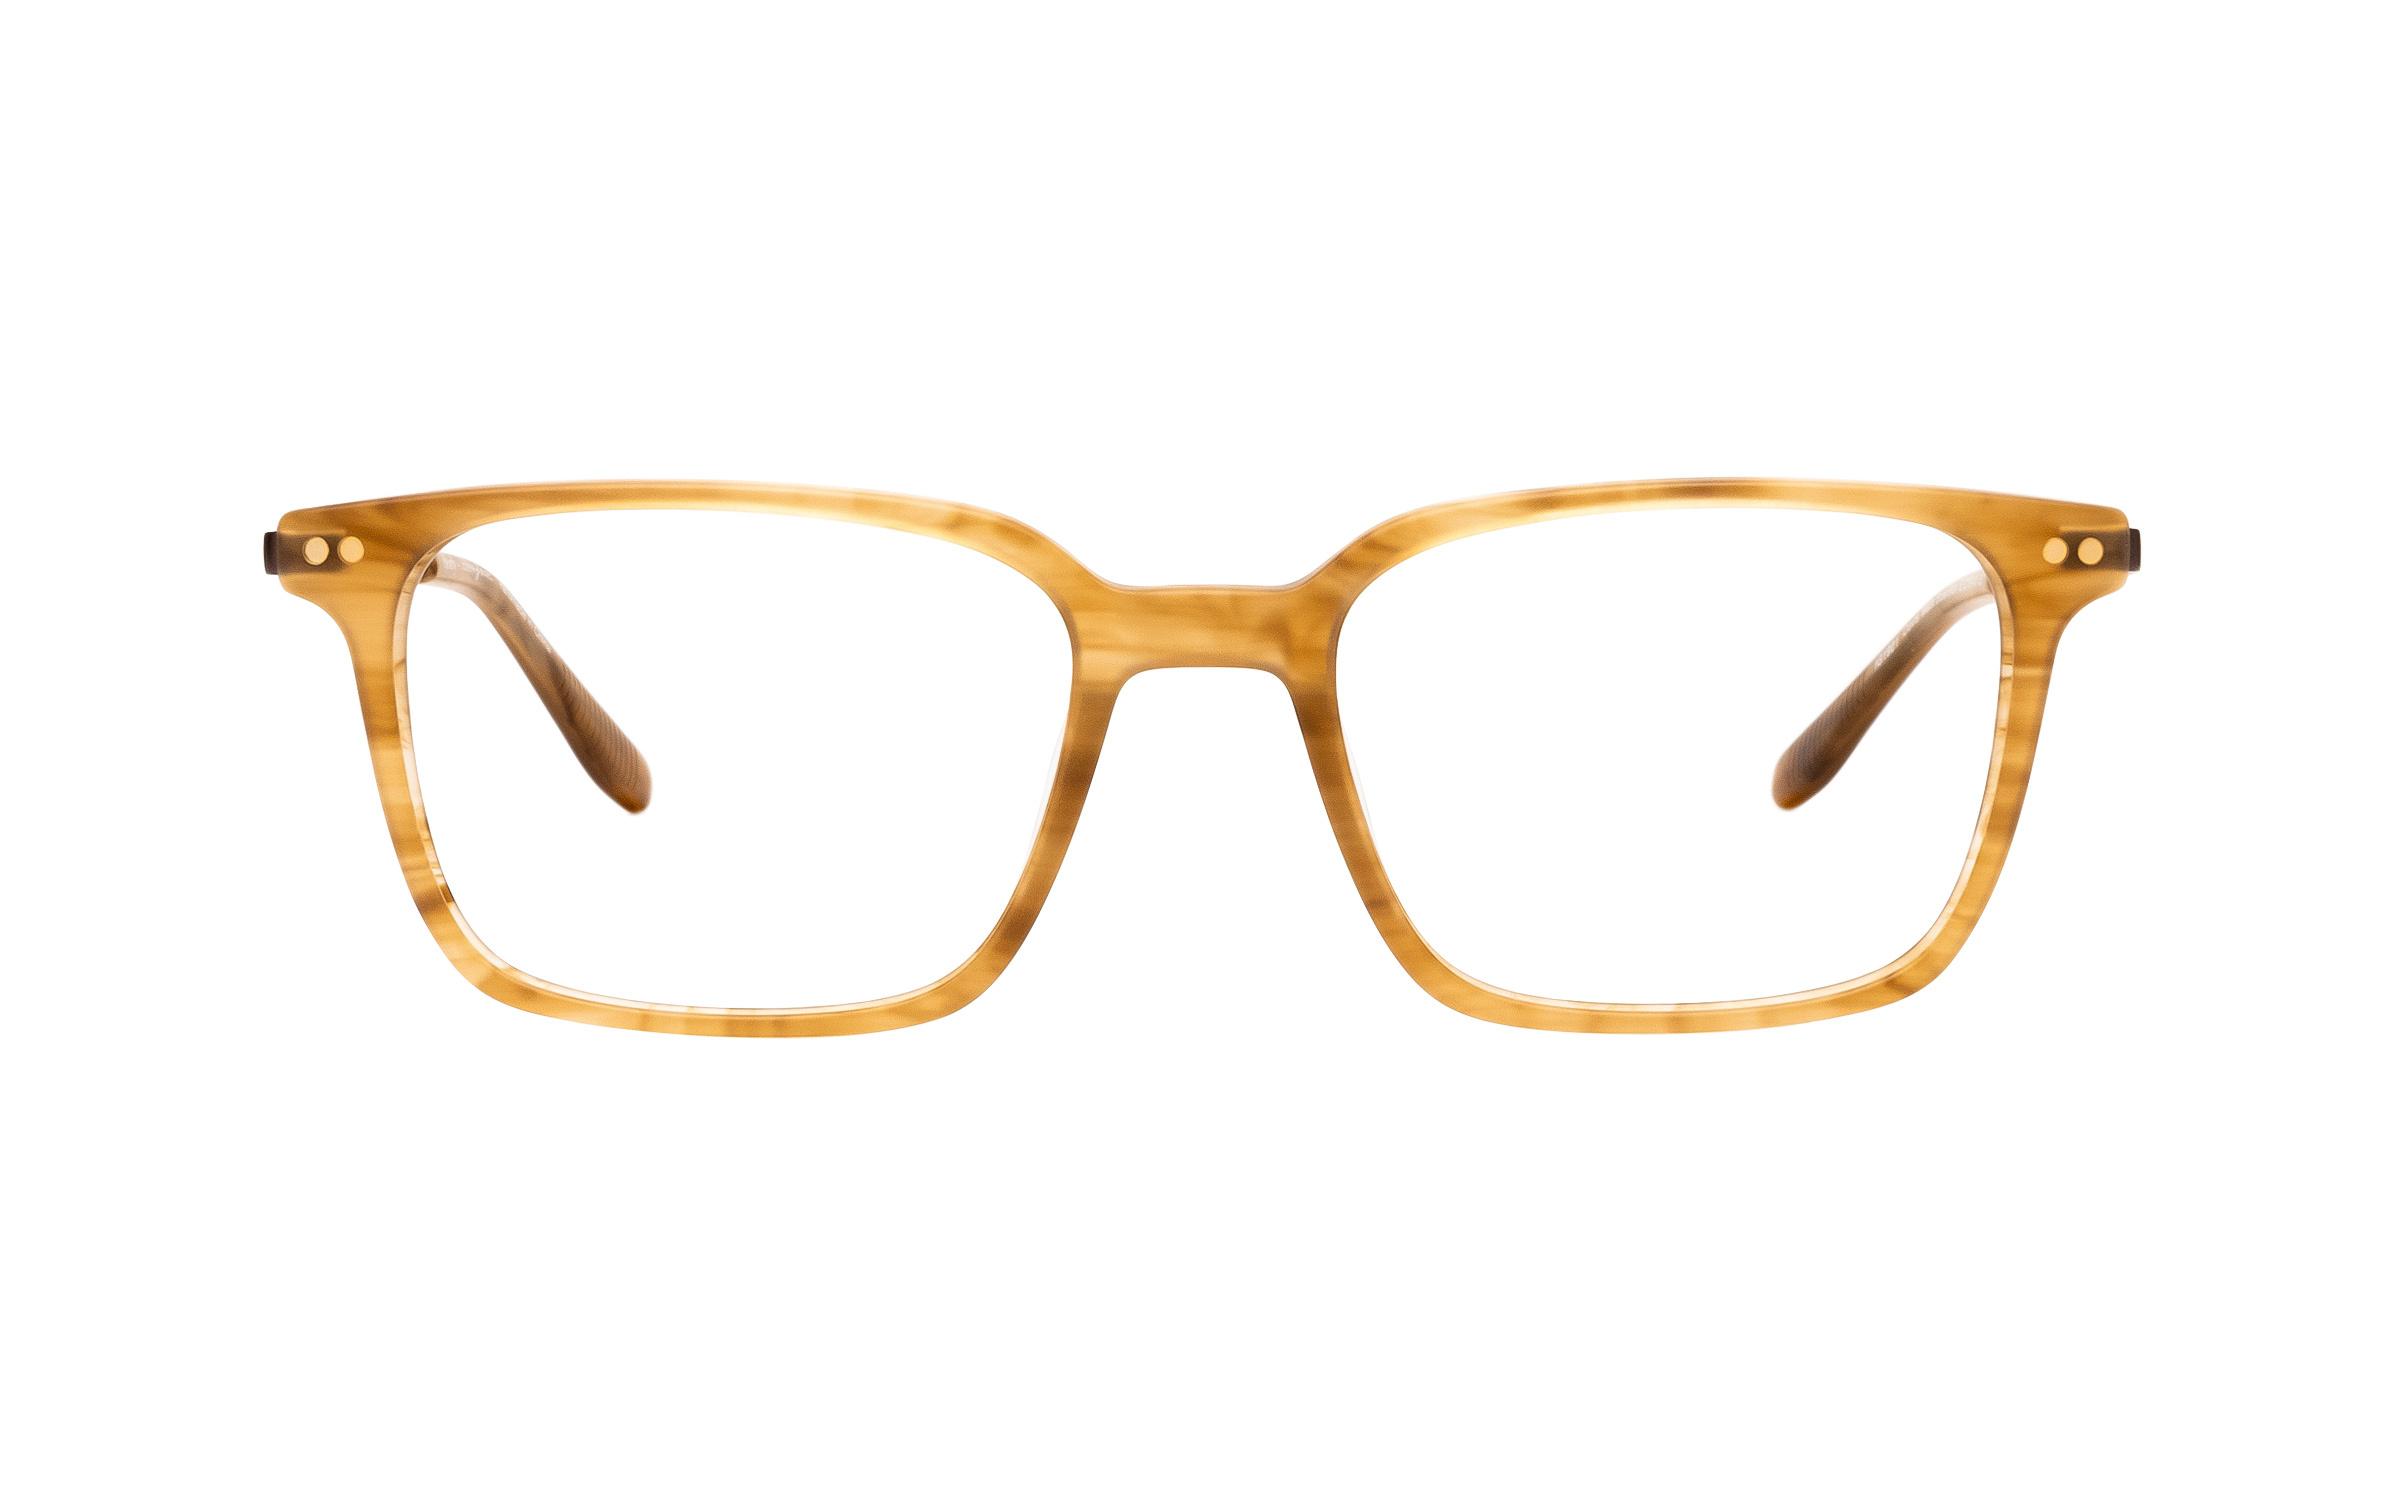 Joseph Marc Davis (52) Eyeglasses and Frame in Matte Horn Brown | Acetate/Metal - Online Coastal